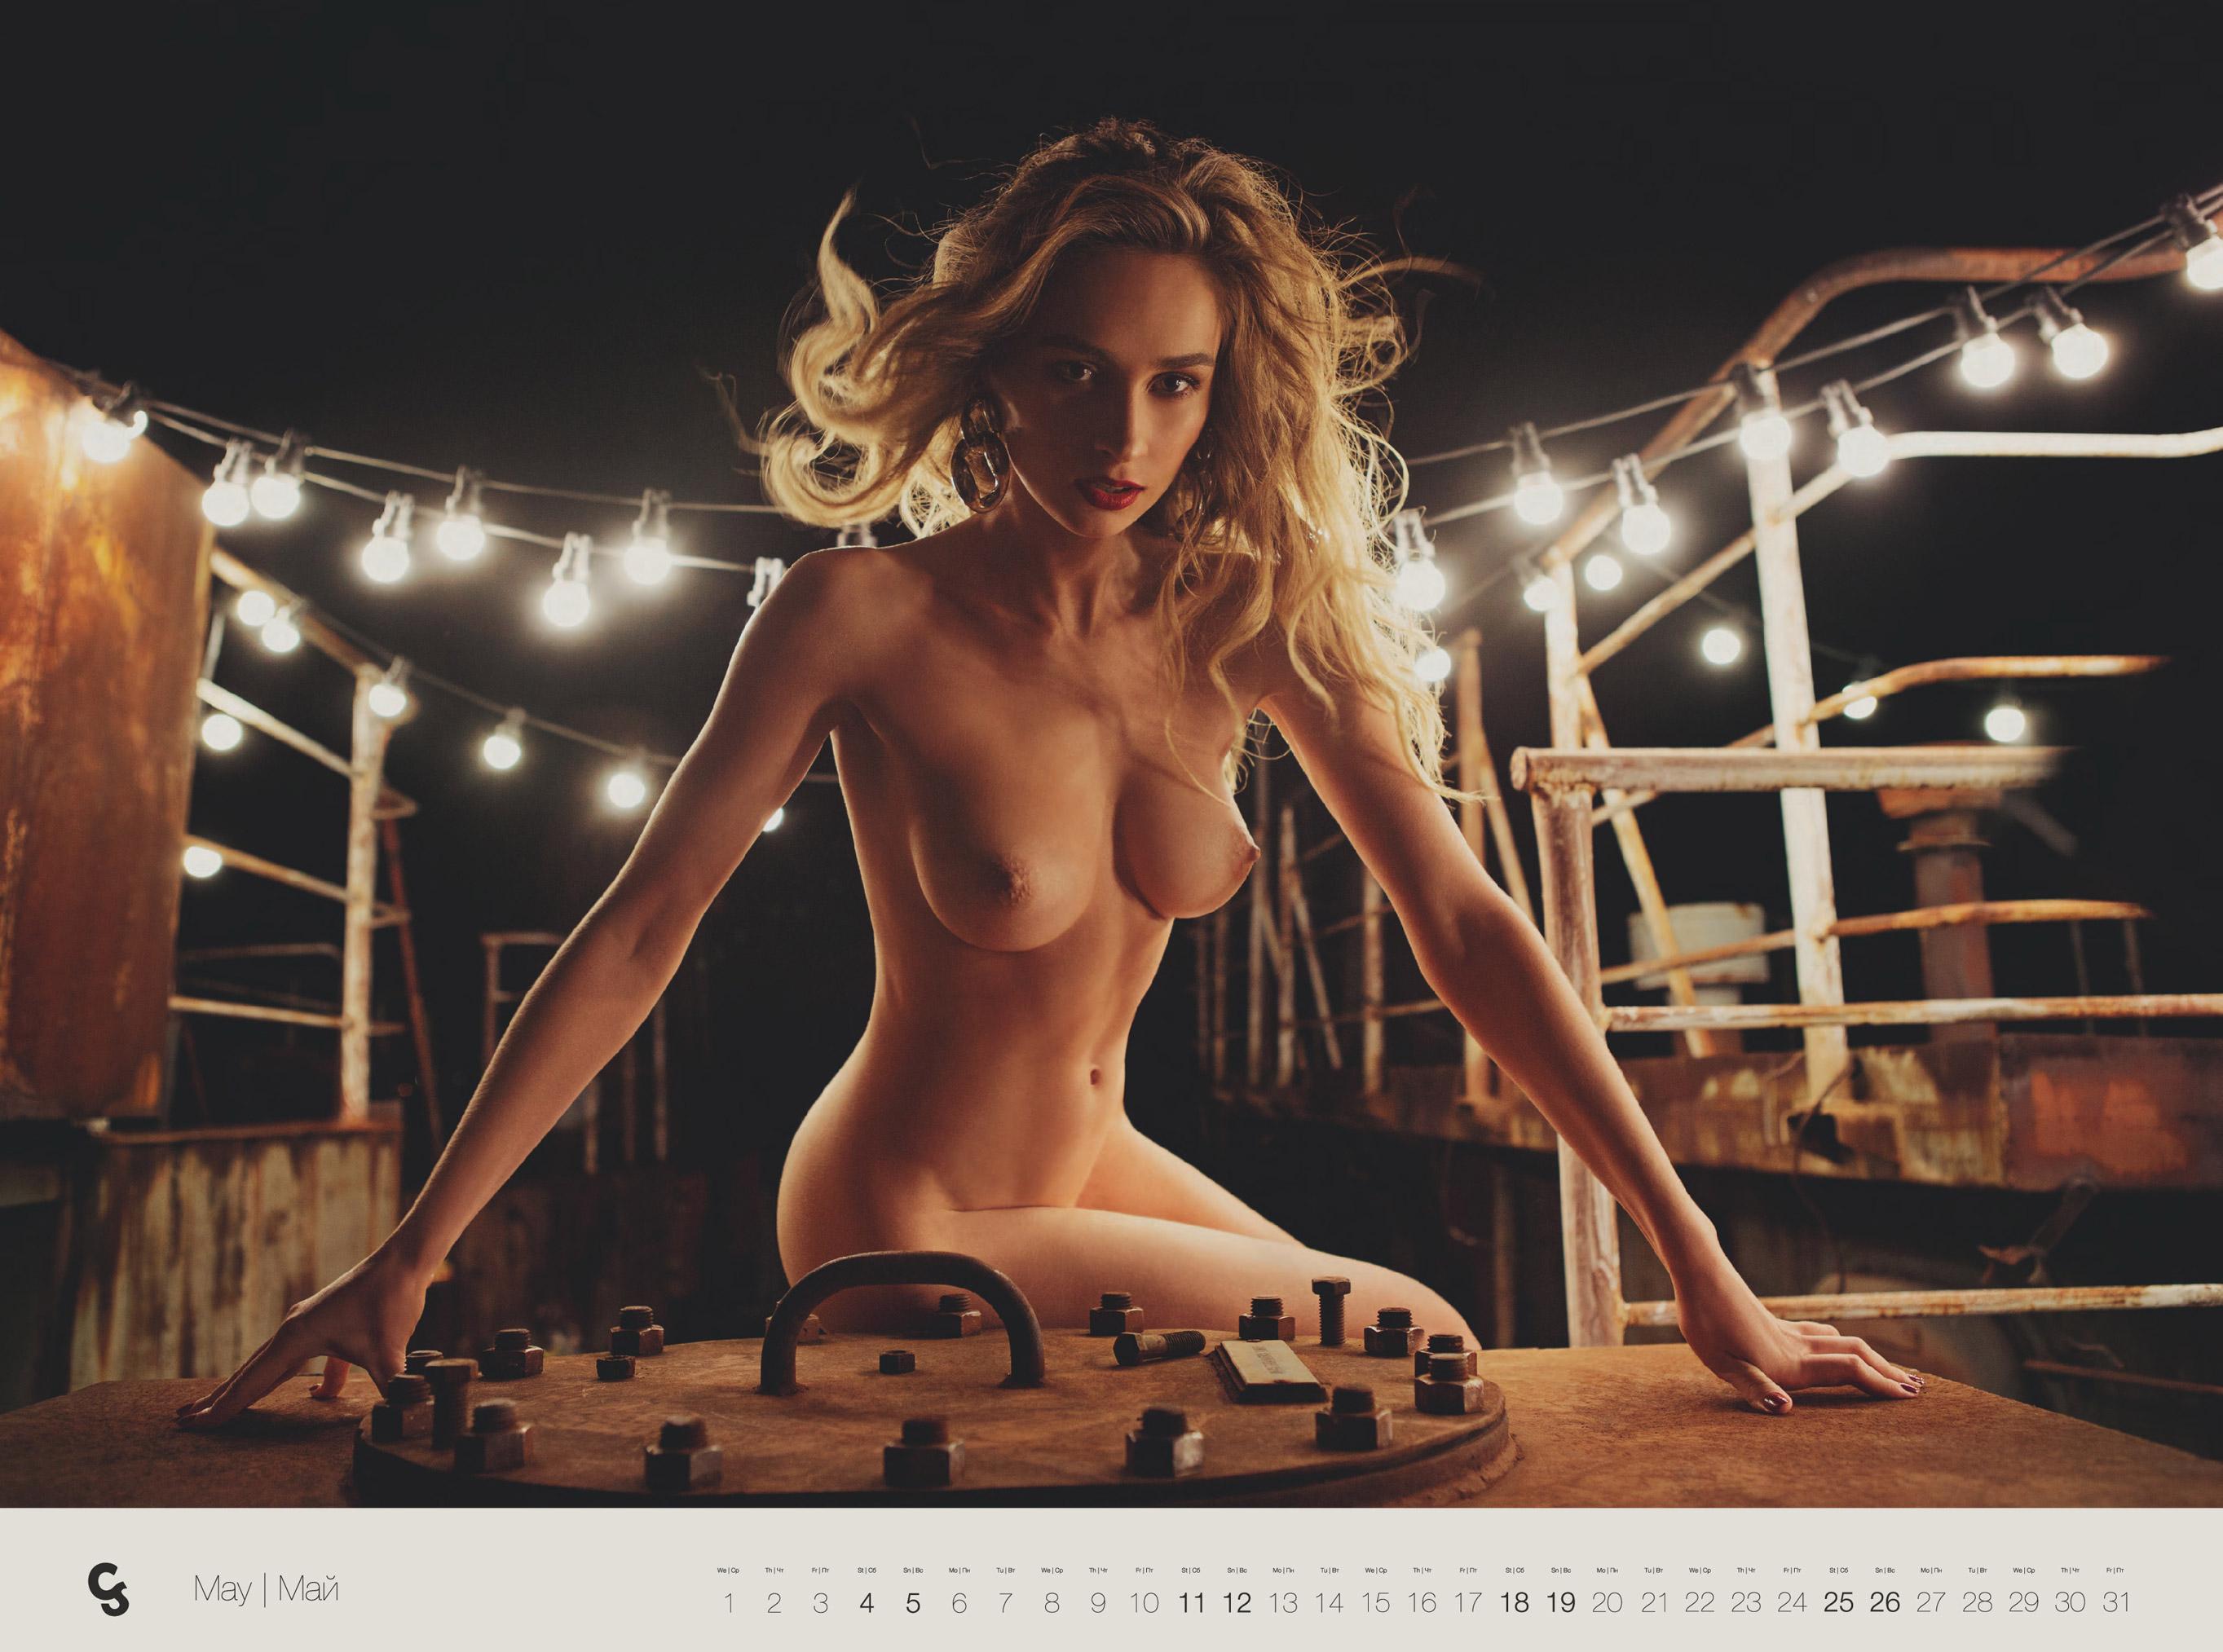 эротический календарь андроид еще блузка